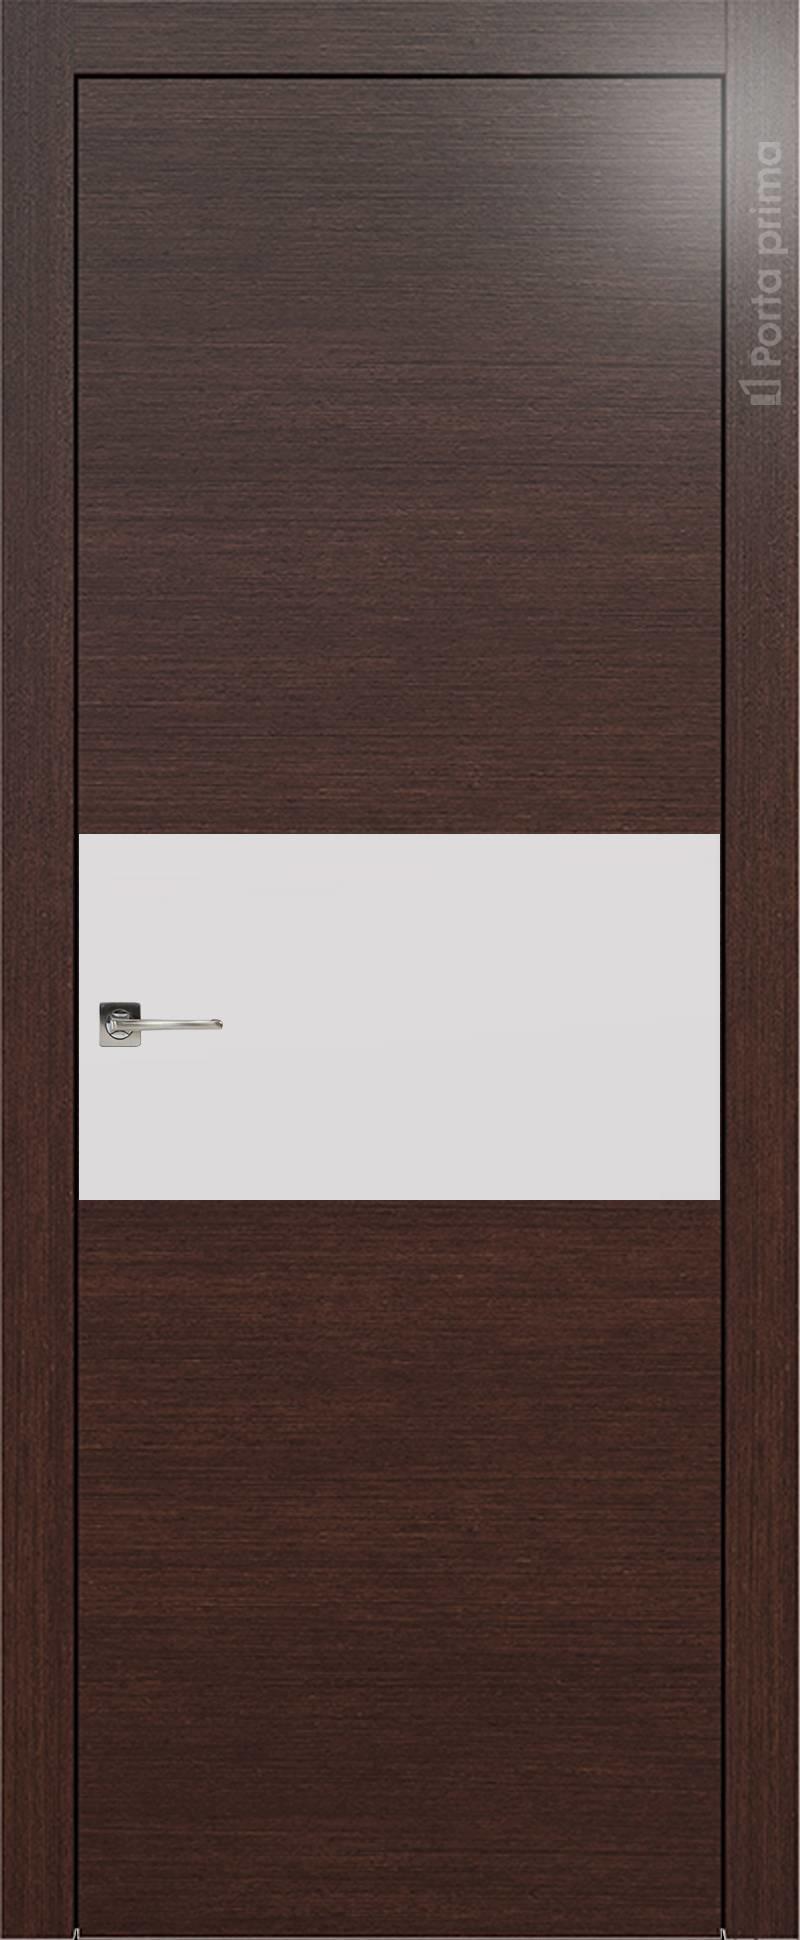 Tivoli Е-4 цвет - Венге Без стекла (ДГ)